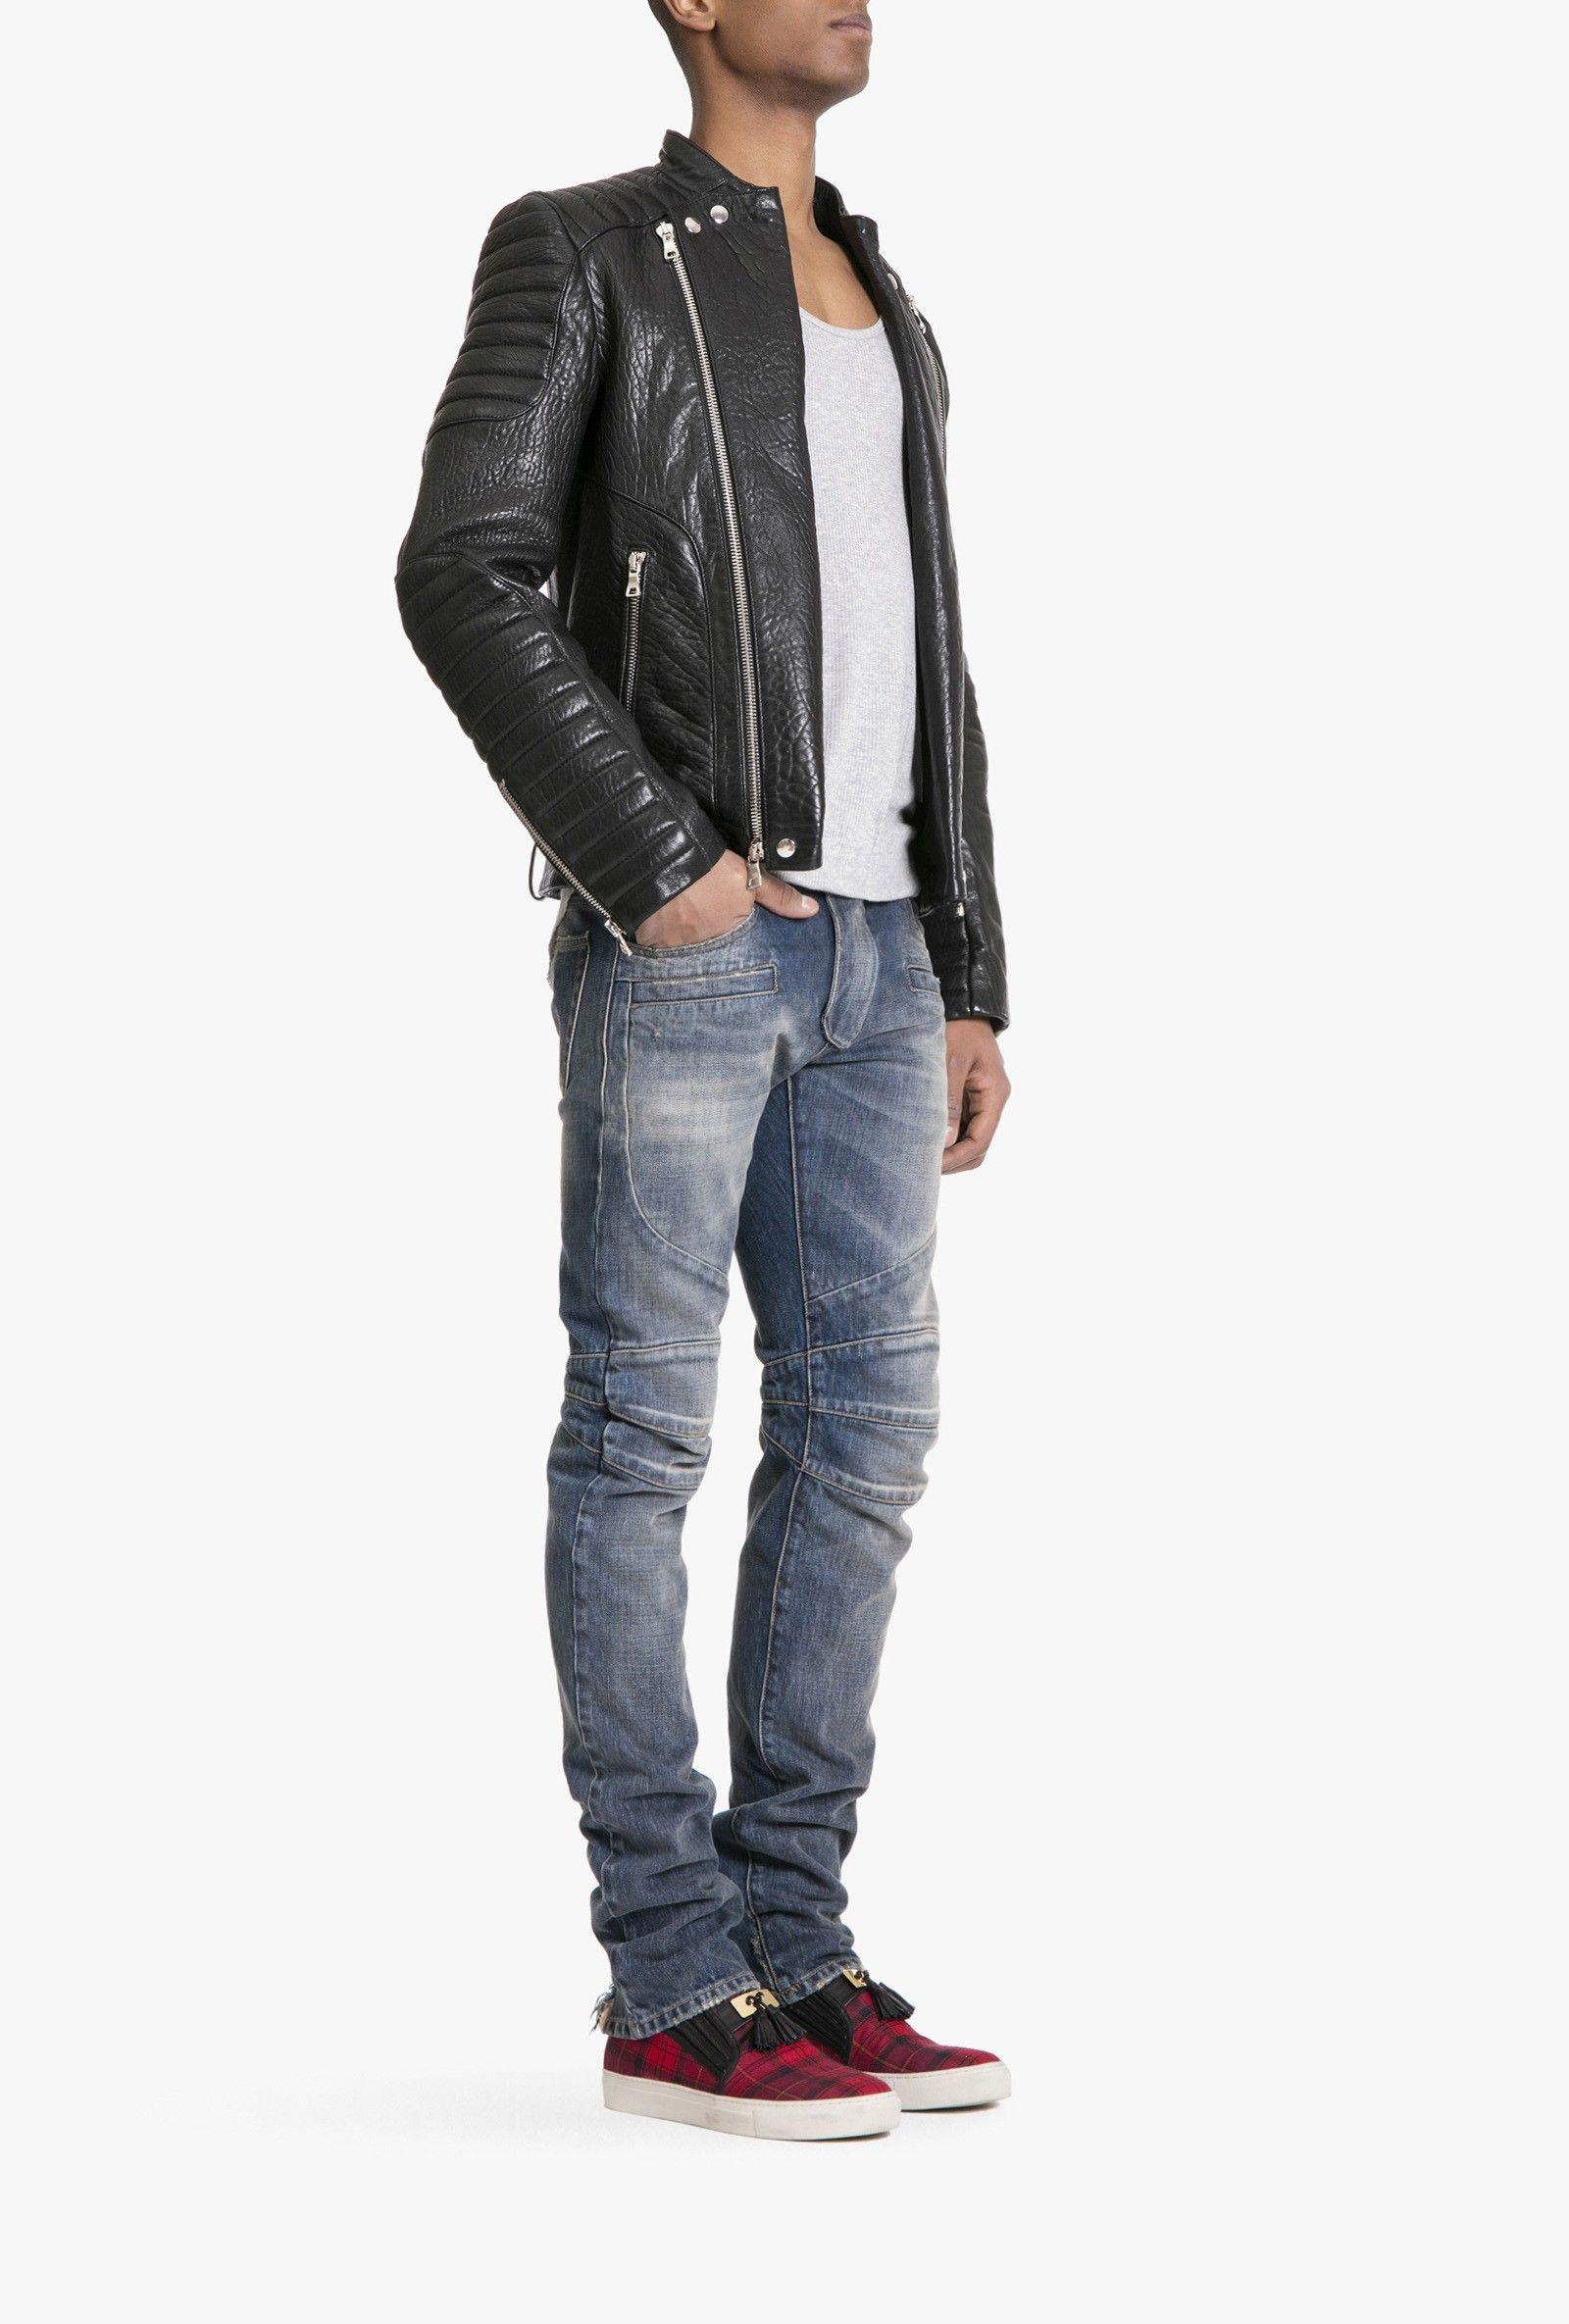 f2e7876c67dc Balmain - Leather biker jacket - Mens leather jackets   MENs ...